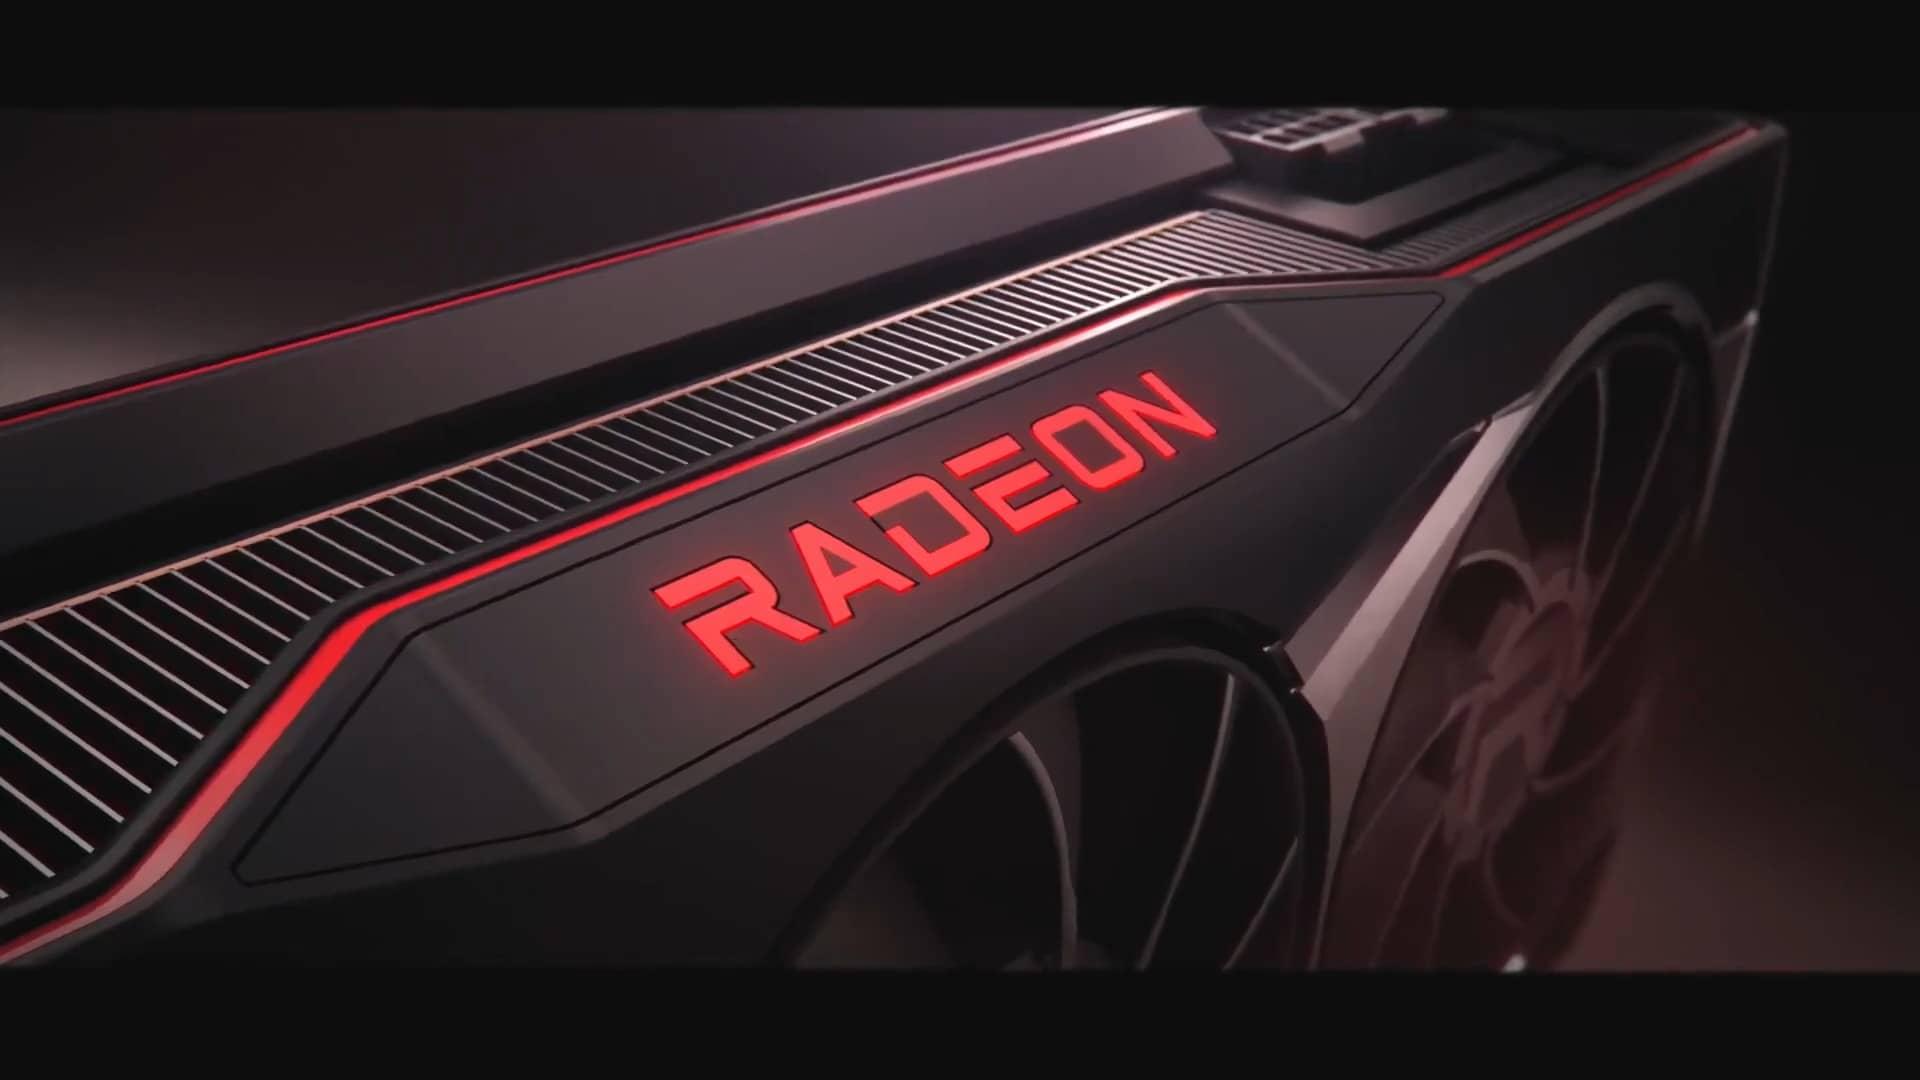 Radeon ADrenalin Software